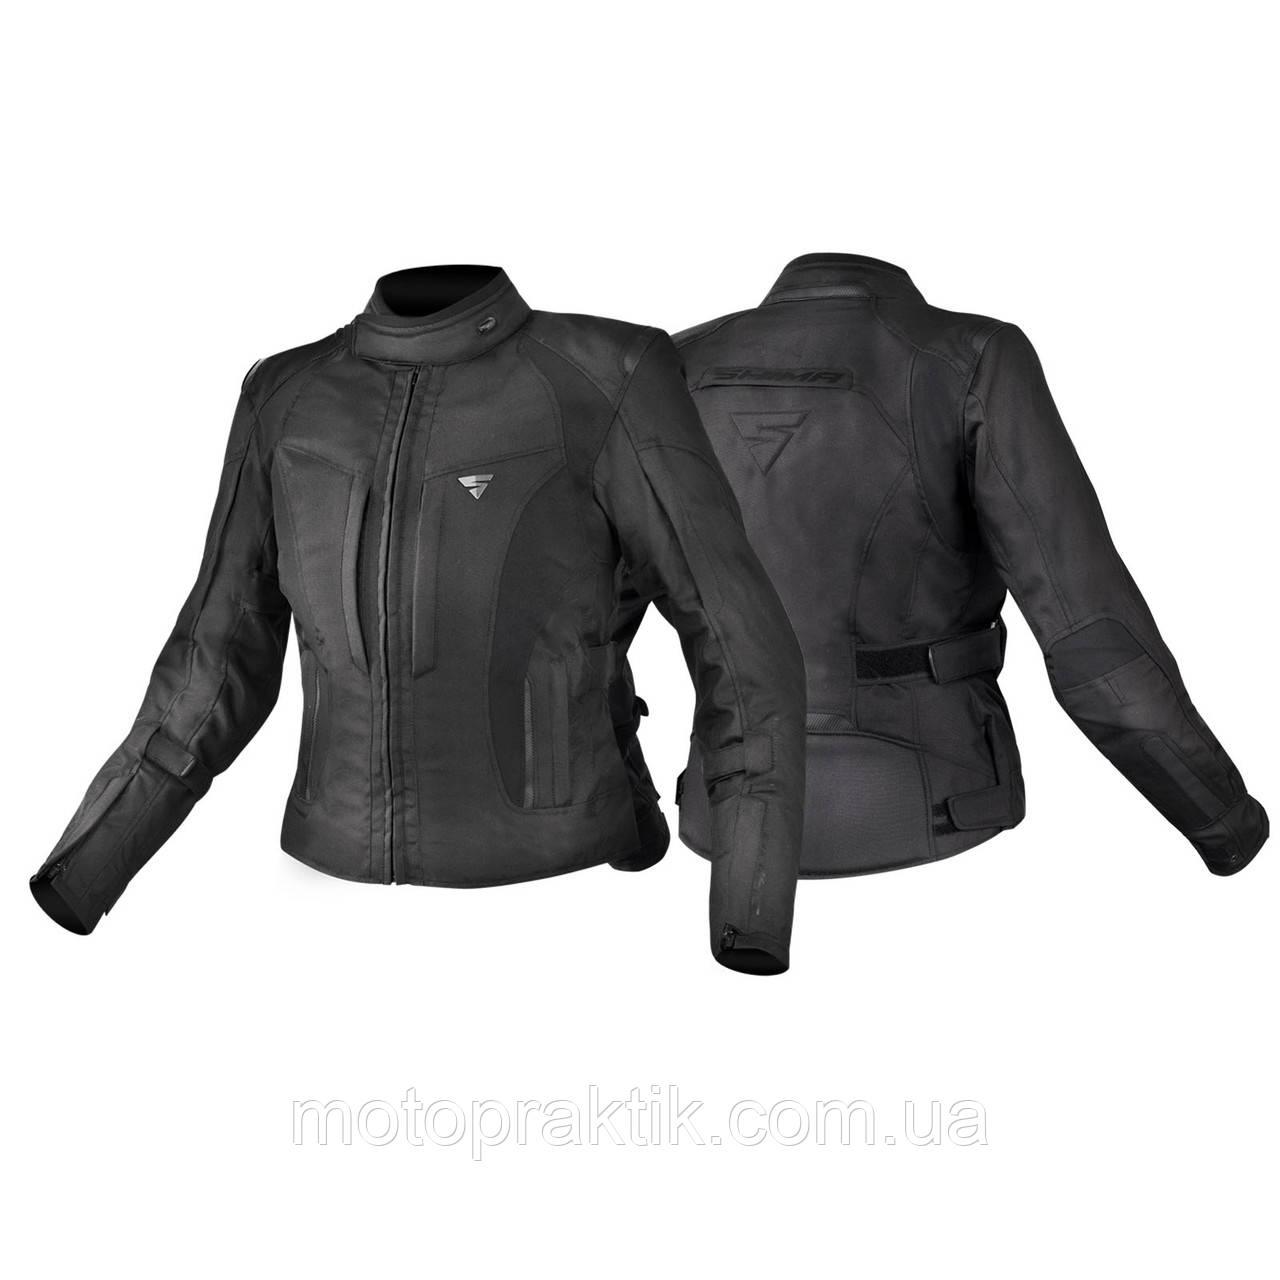 Shima Volante Lady Jacket, Black, XS, Мотокуртка текстильная женская